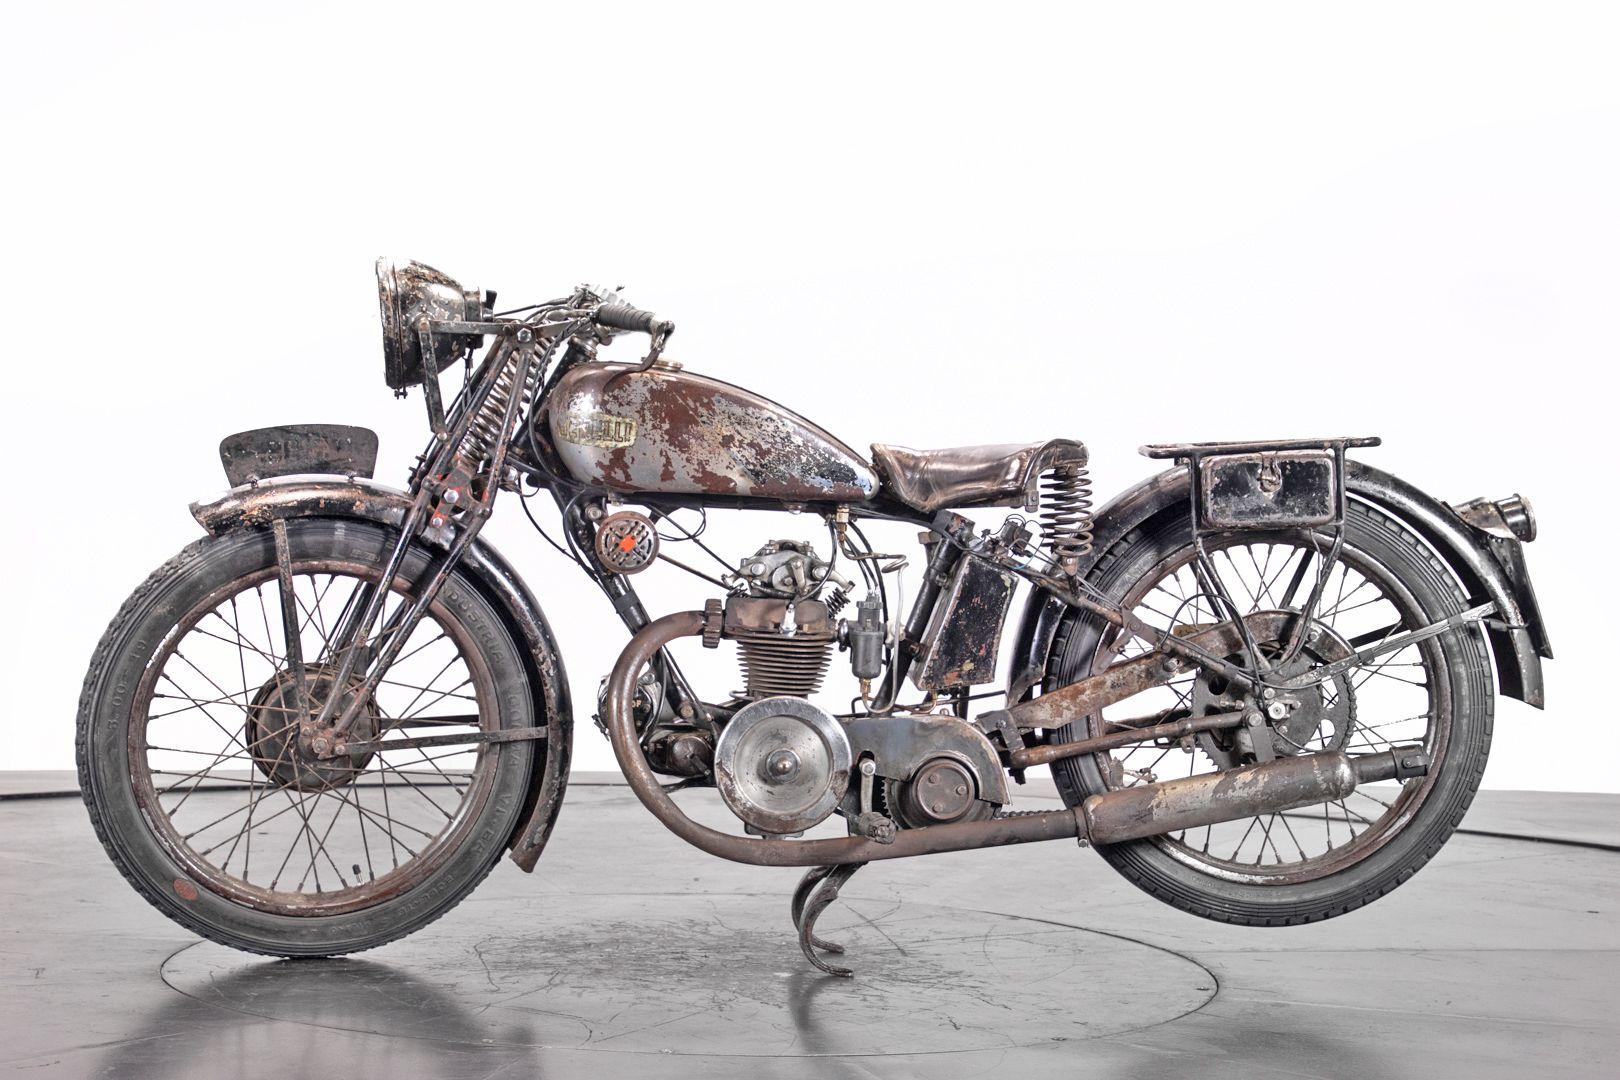 1938 Benelli 175 74485